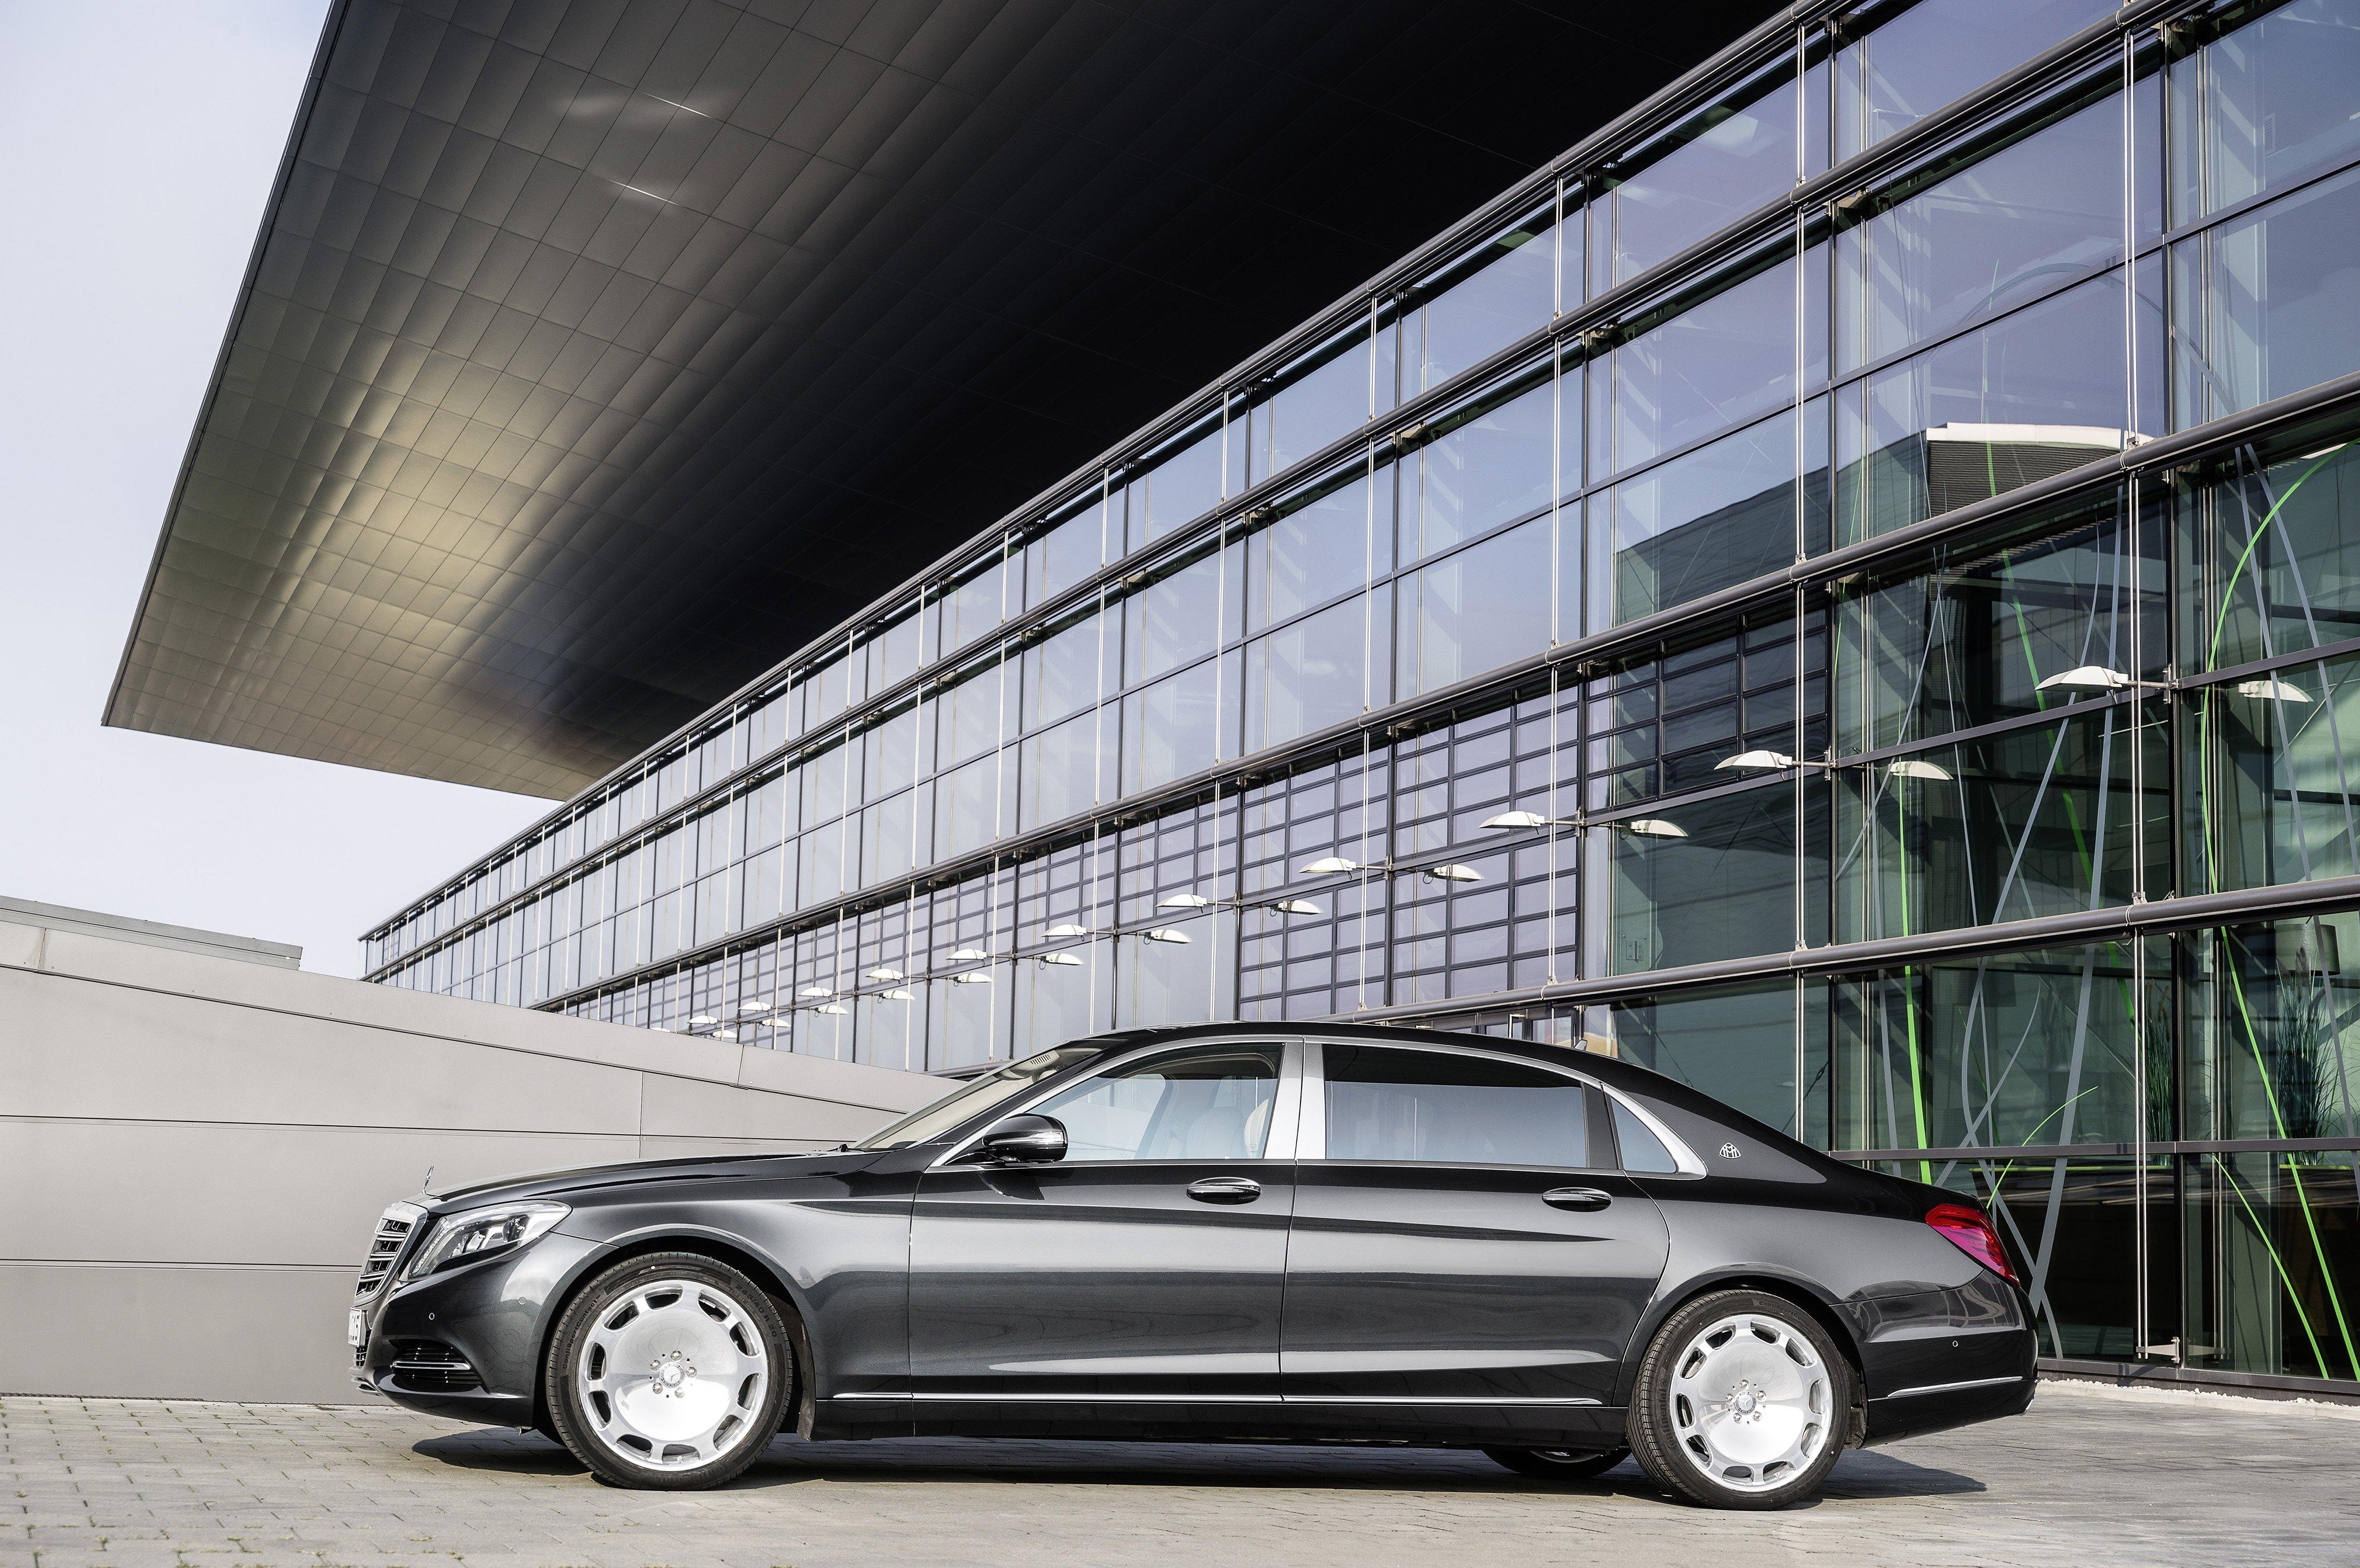 2015 Mercedes Benz Maybach S600 X222 luxury wallpaper 4096x2722